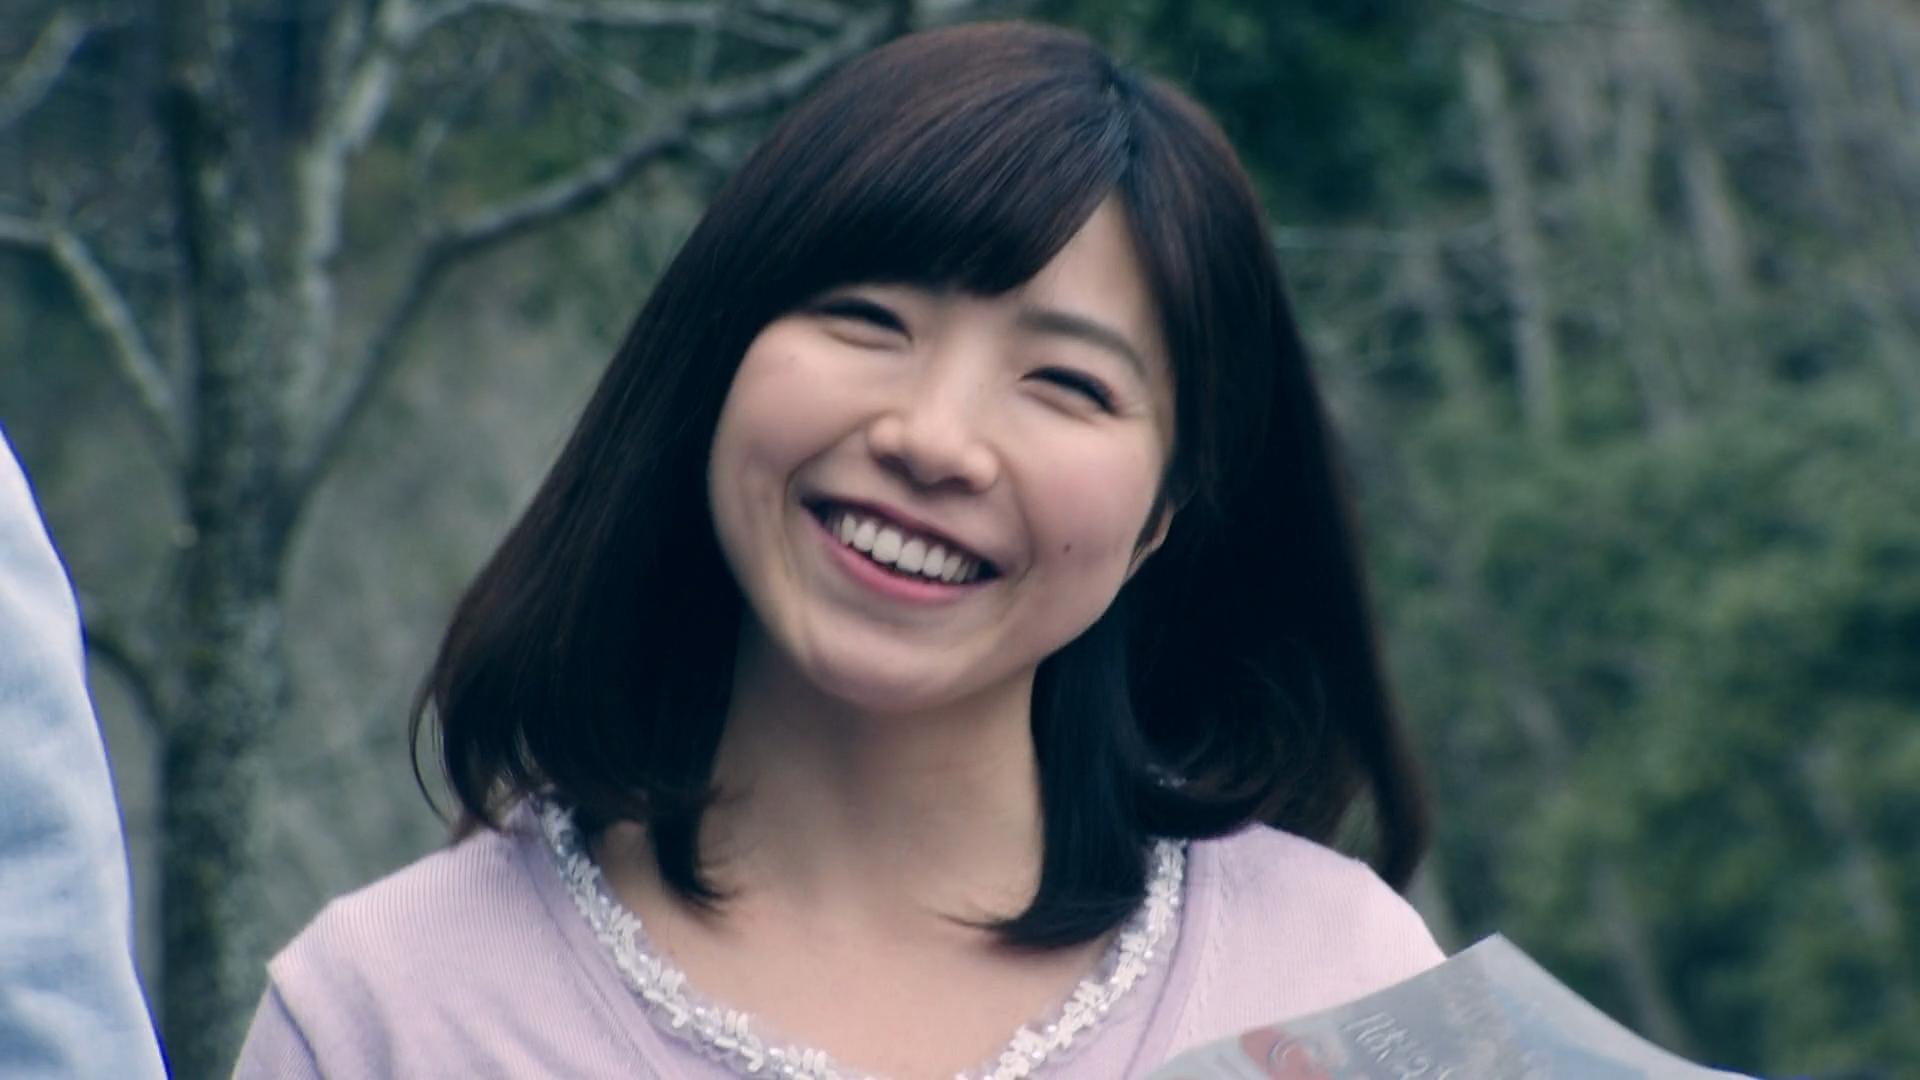 Namie Tokiwa